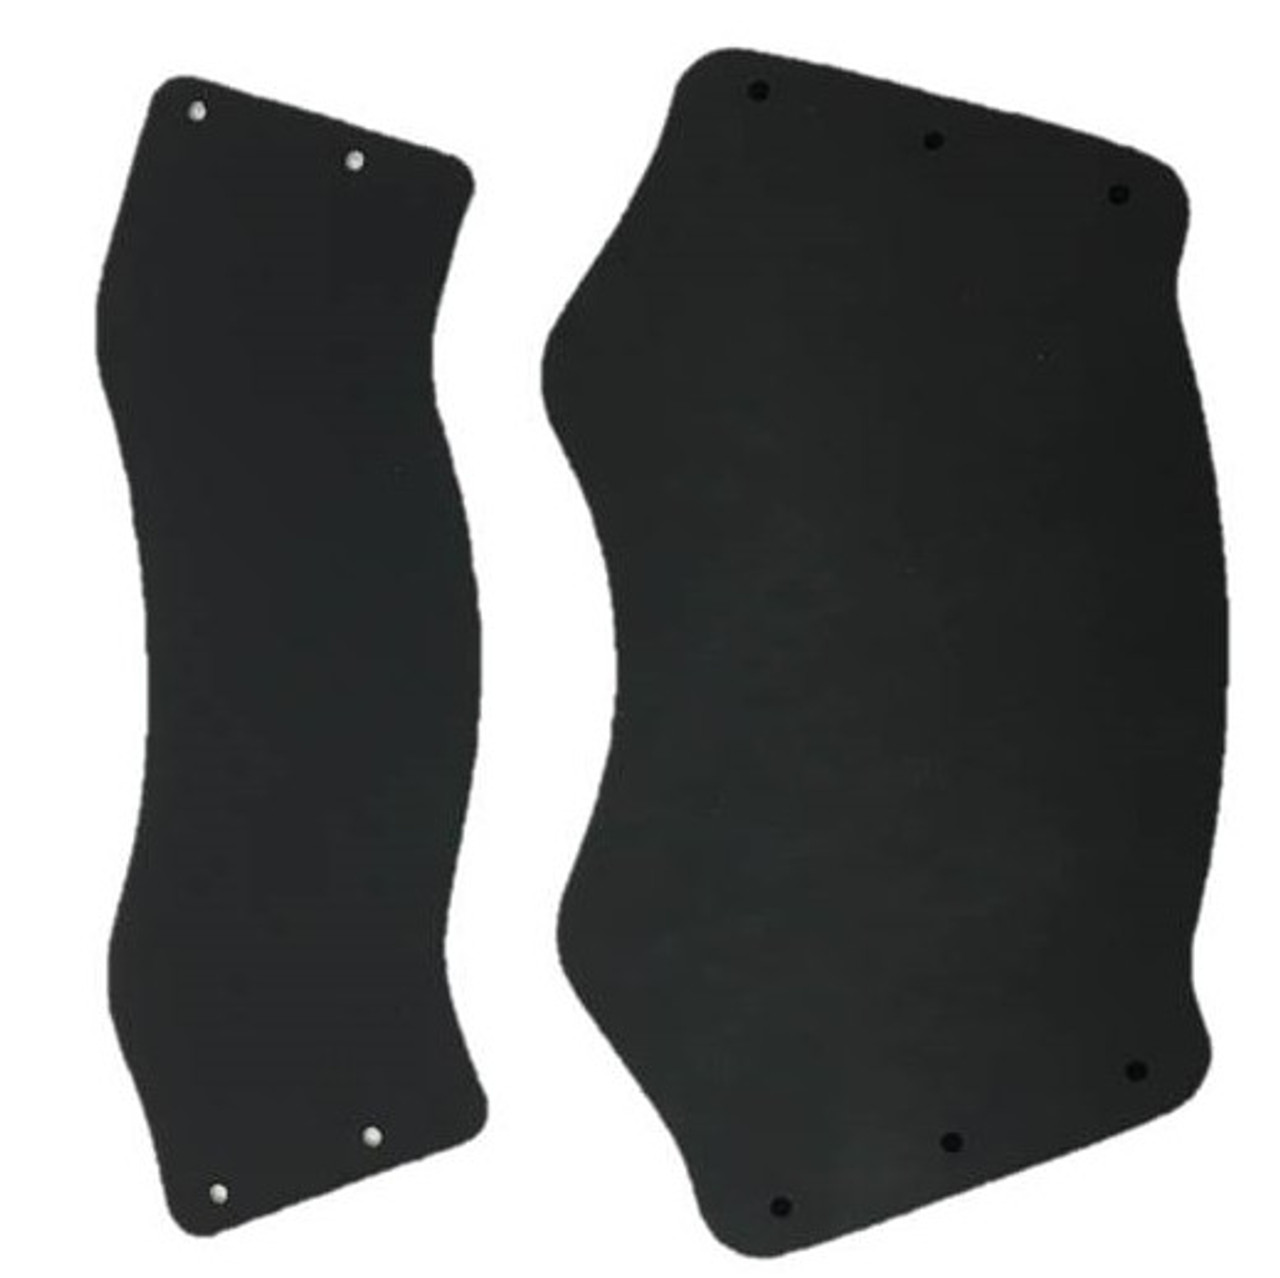 Wiley Rear Toe Rubber & Overlay